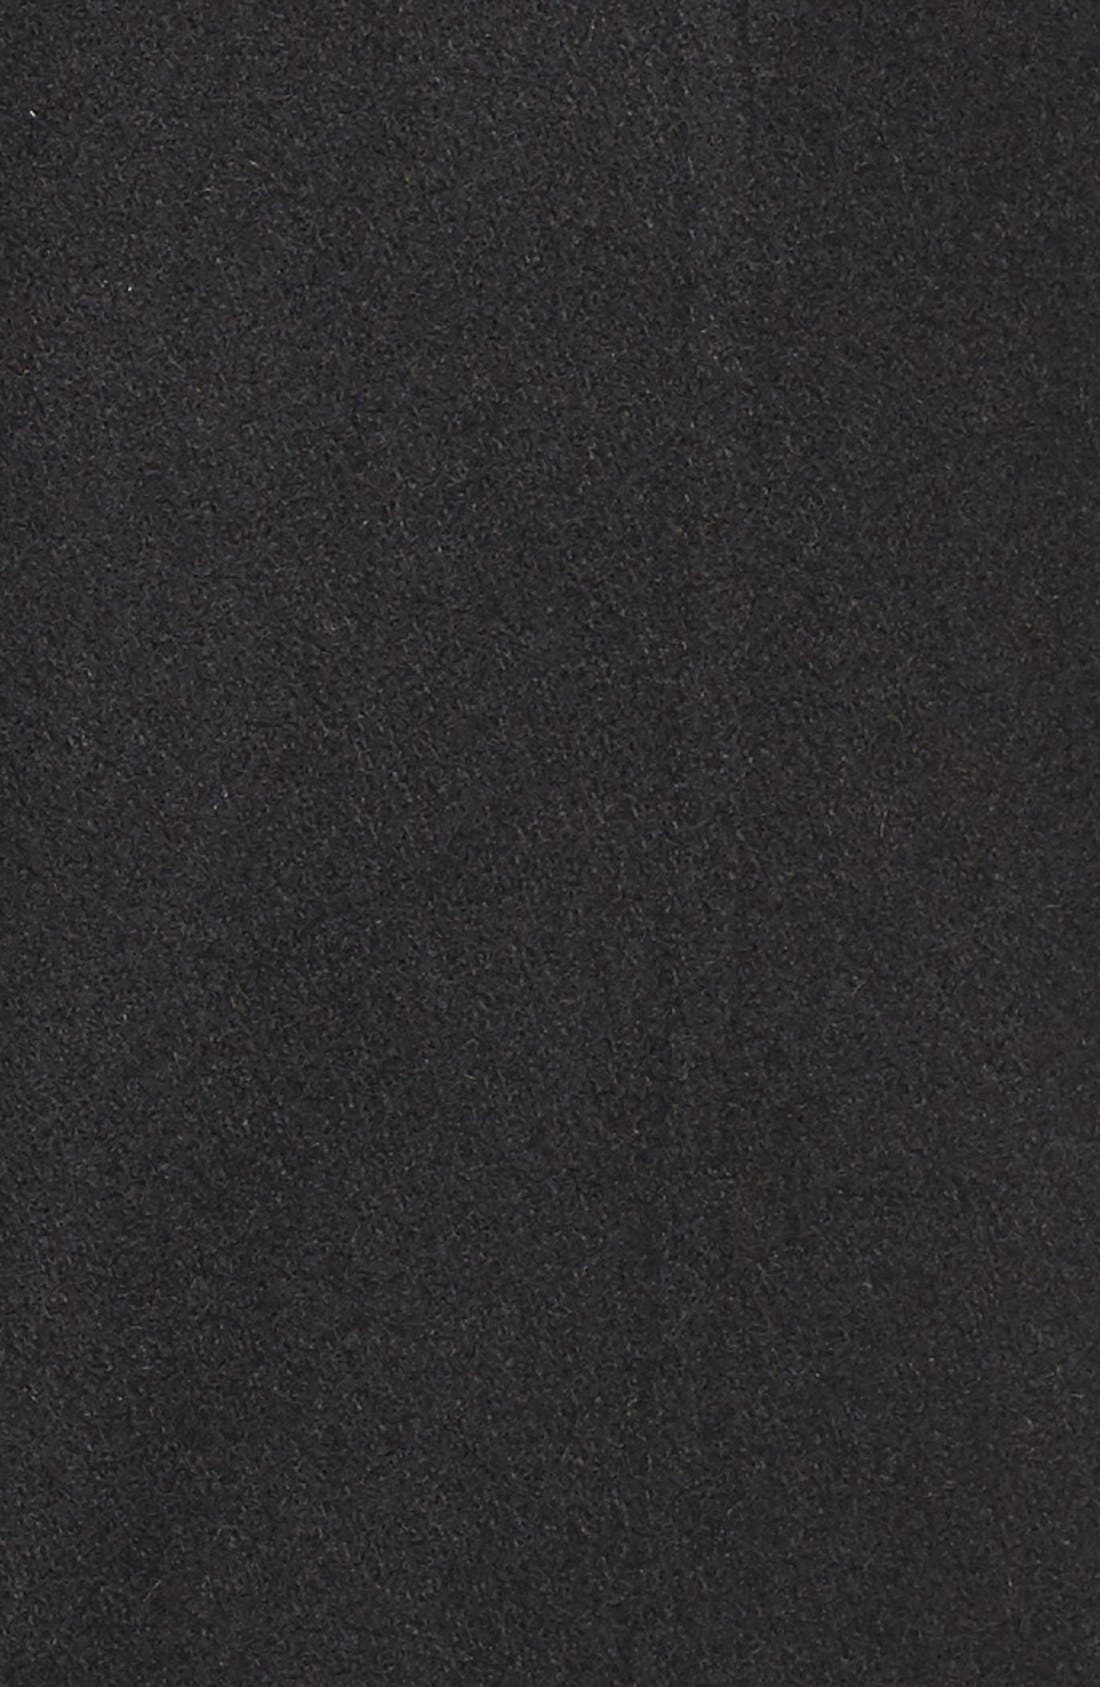 Wool Blend Coat with Faux Fur Trim,                             Alternate thumbnail 5, color,                             001